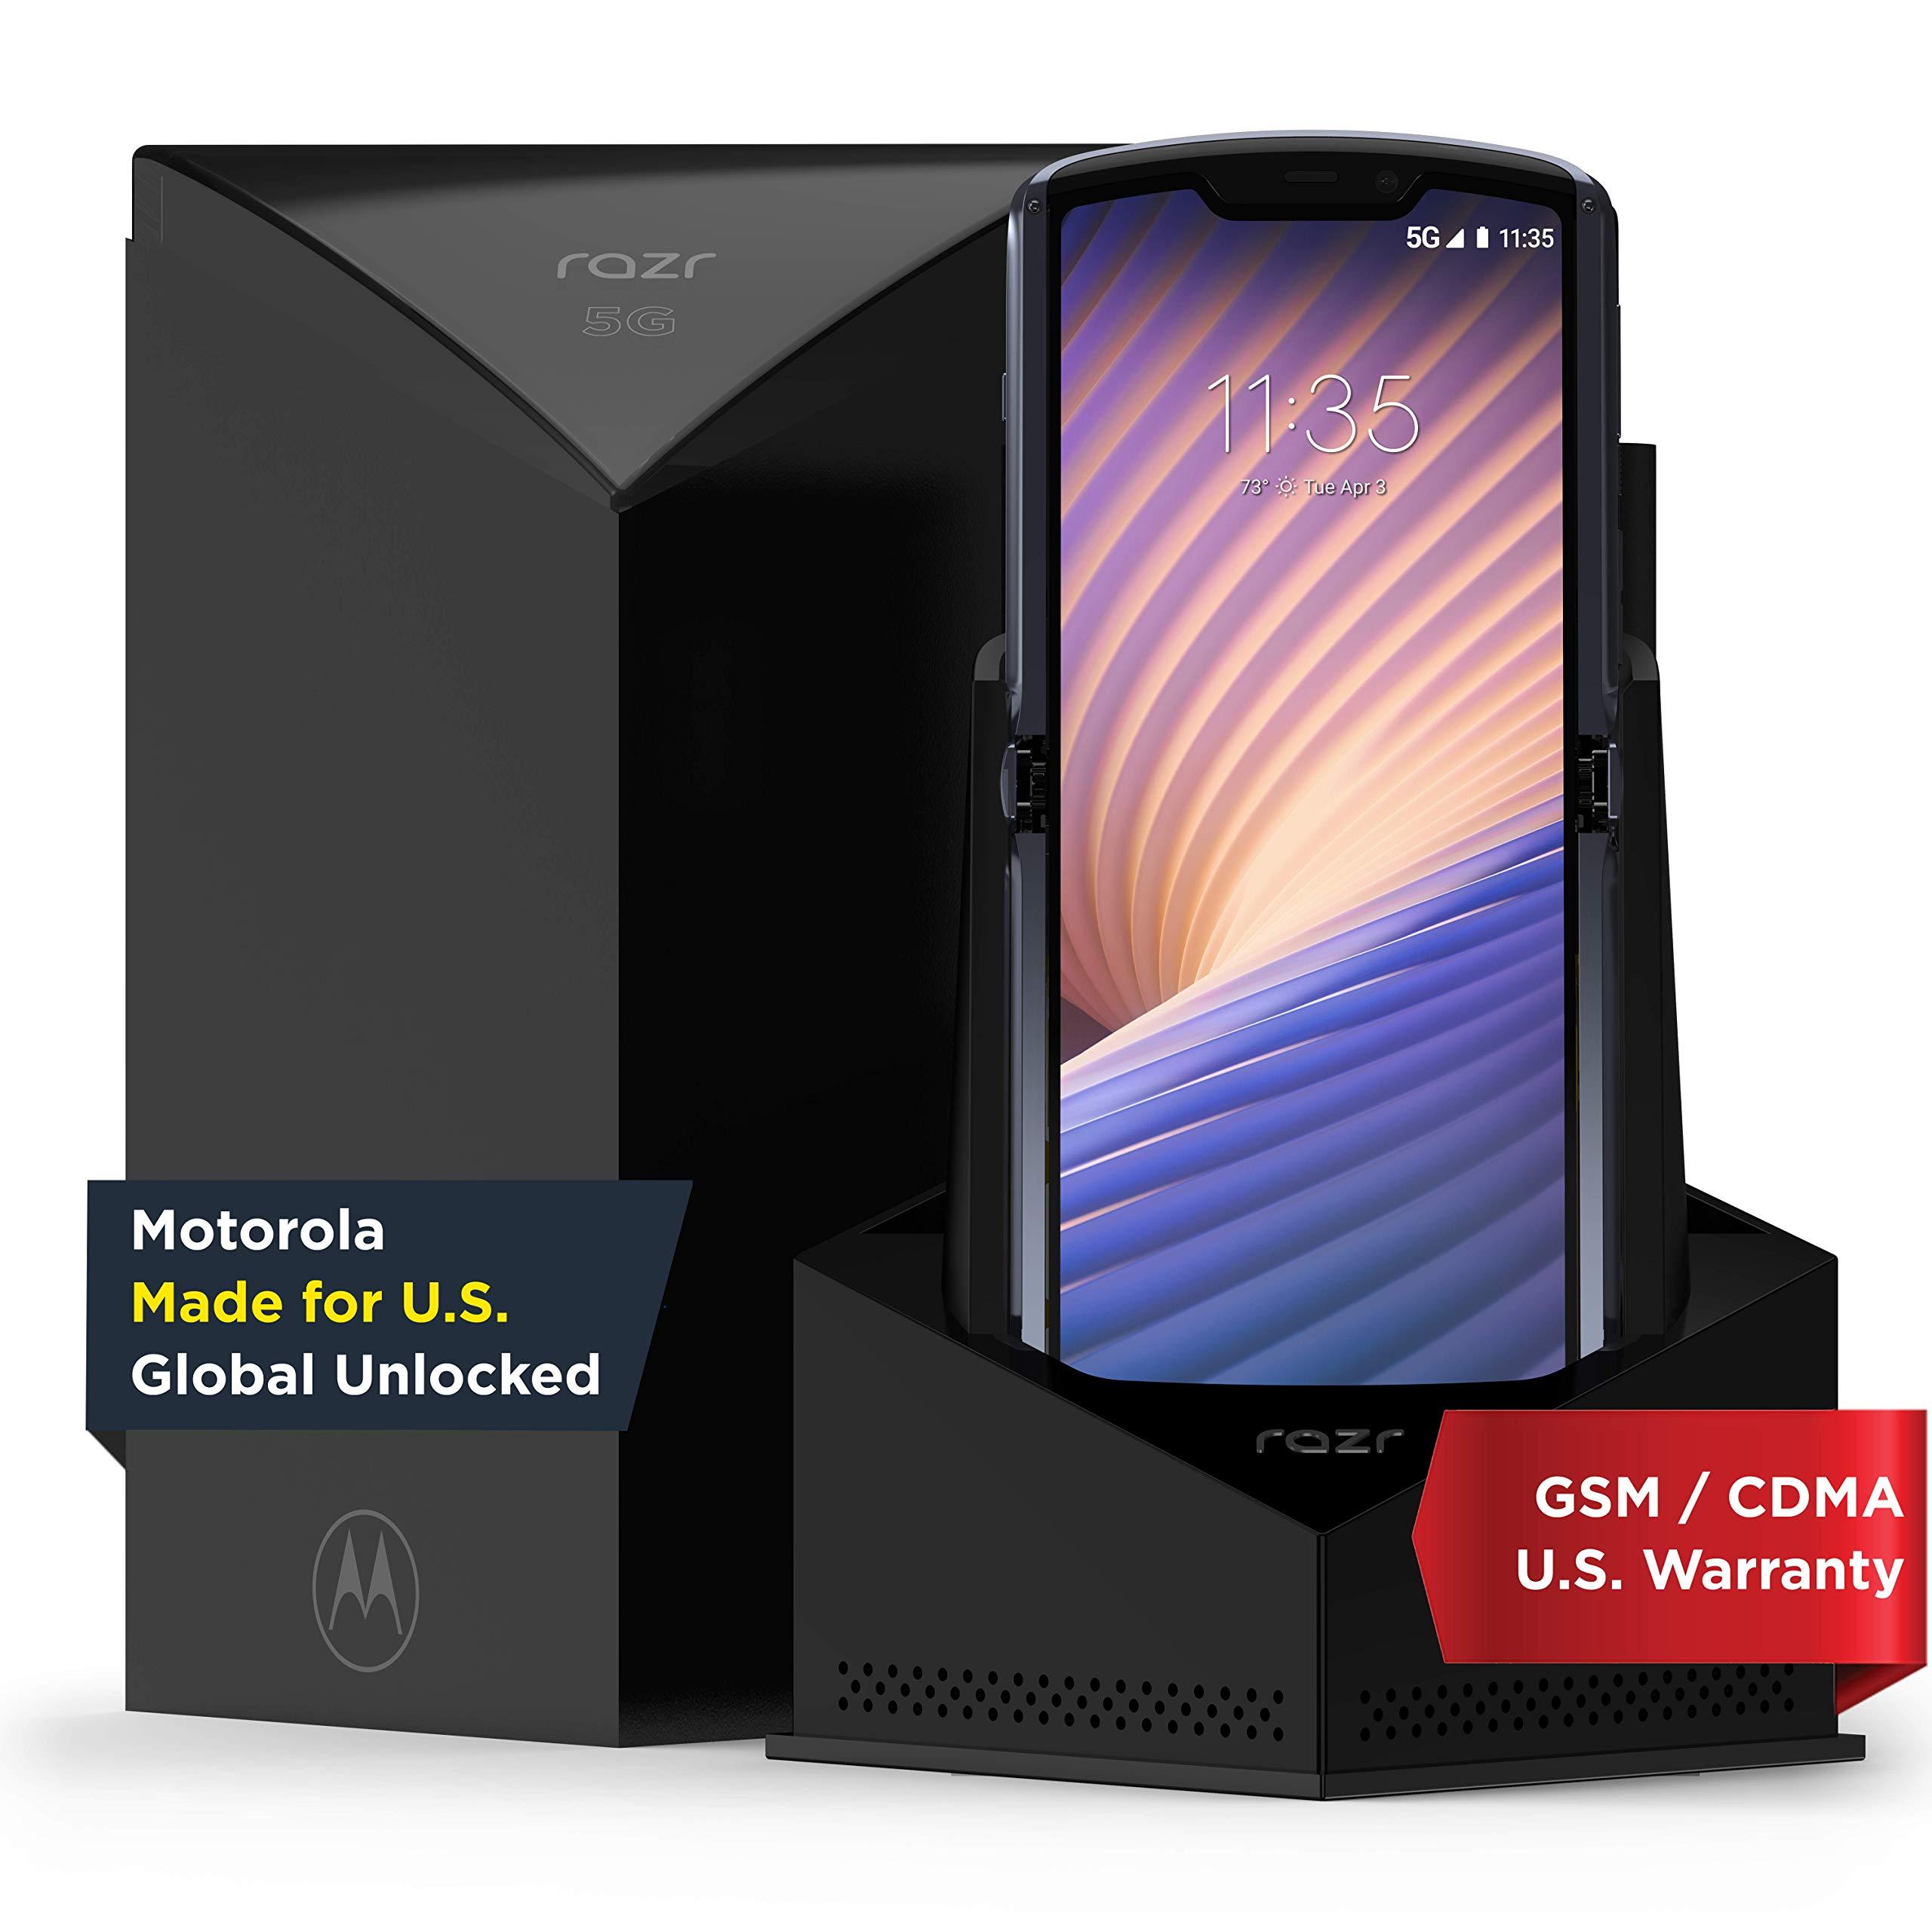 Motorola Razr 5G | Unlocked | Made for US by Motorola | 8/256GB | 48MP Camera | 2020 | Polished Graphite